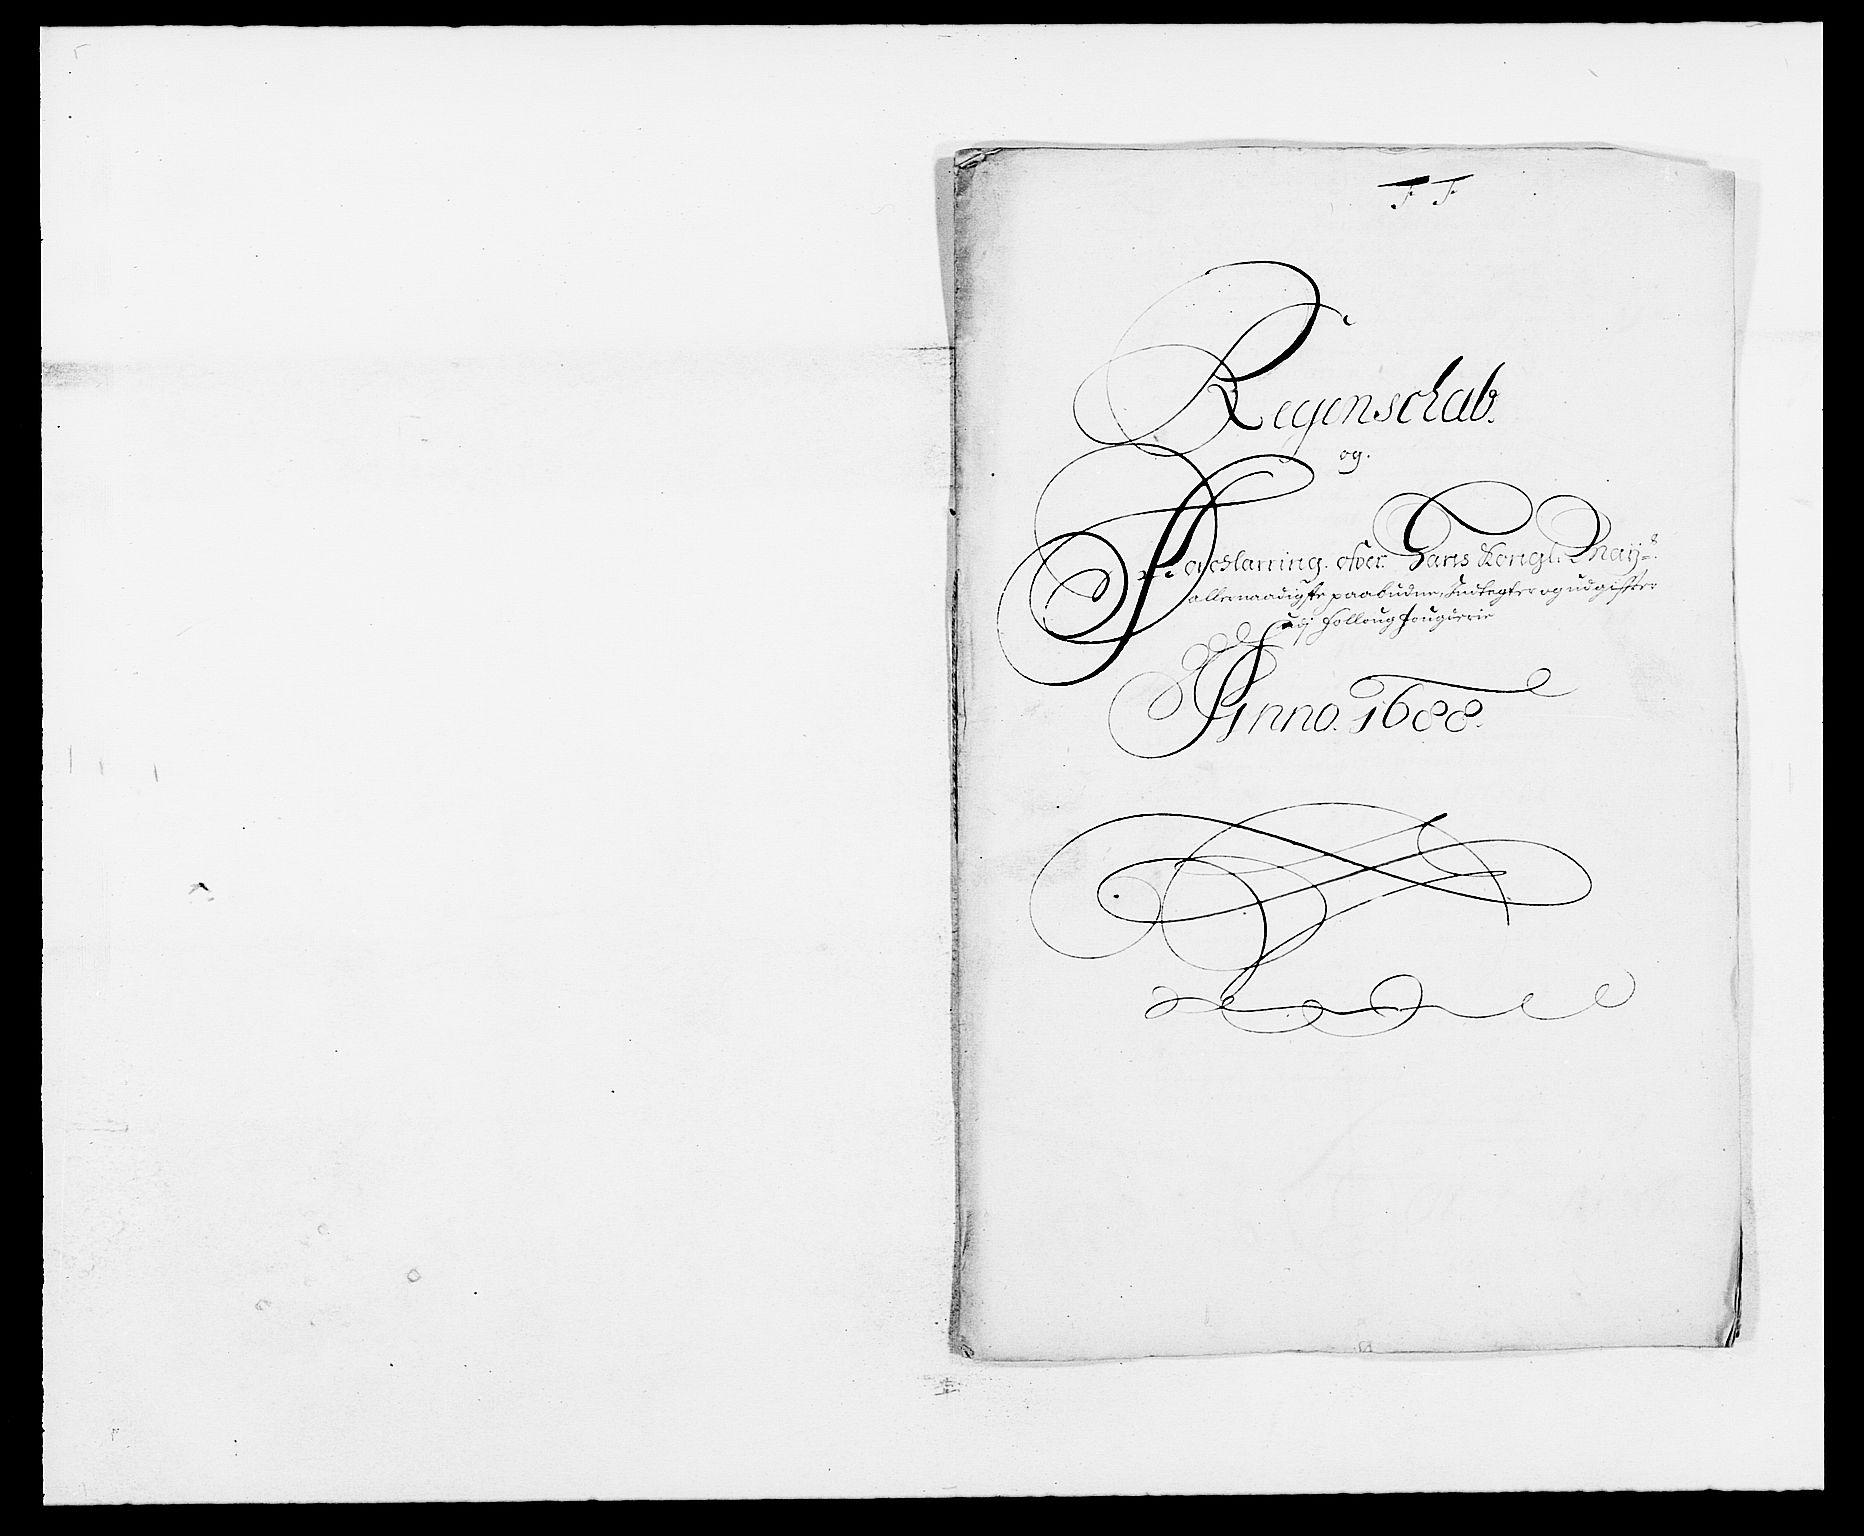 RA, Rentekammeret inntil 1814, Reviderte regnskaper, Fogderegnskap, R09/L0434: Fogderegnskap Follo, 1687-1688, s. 196